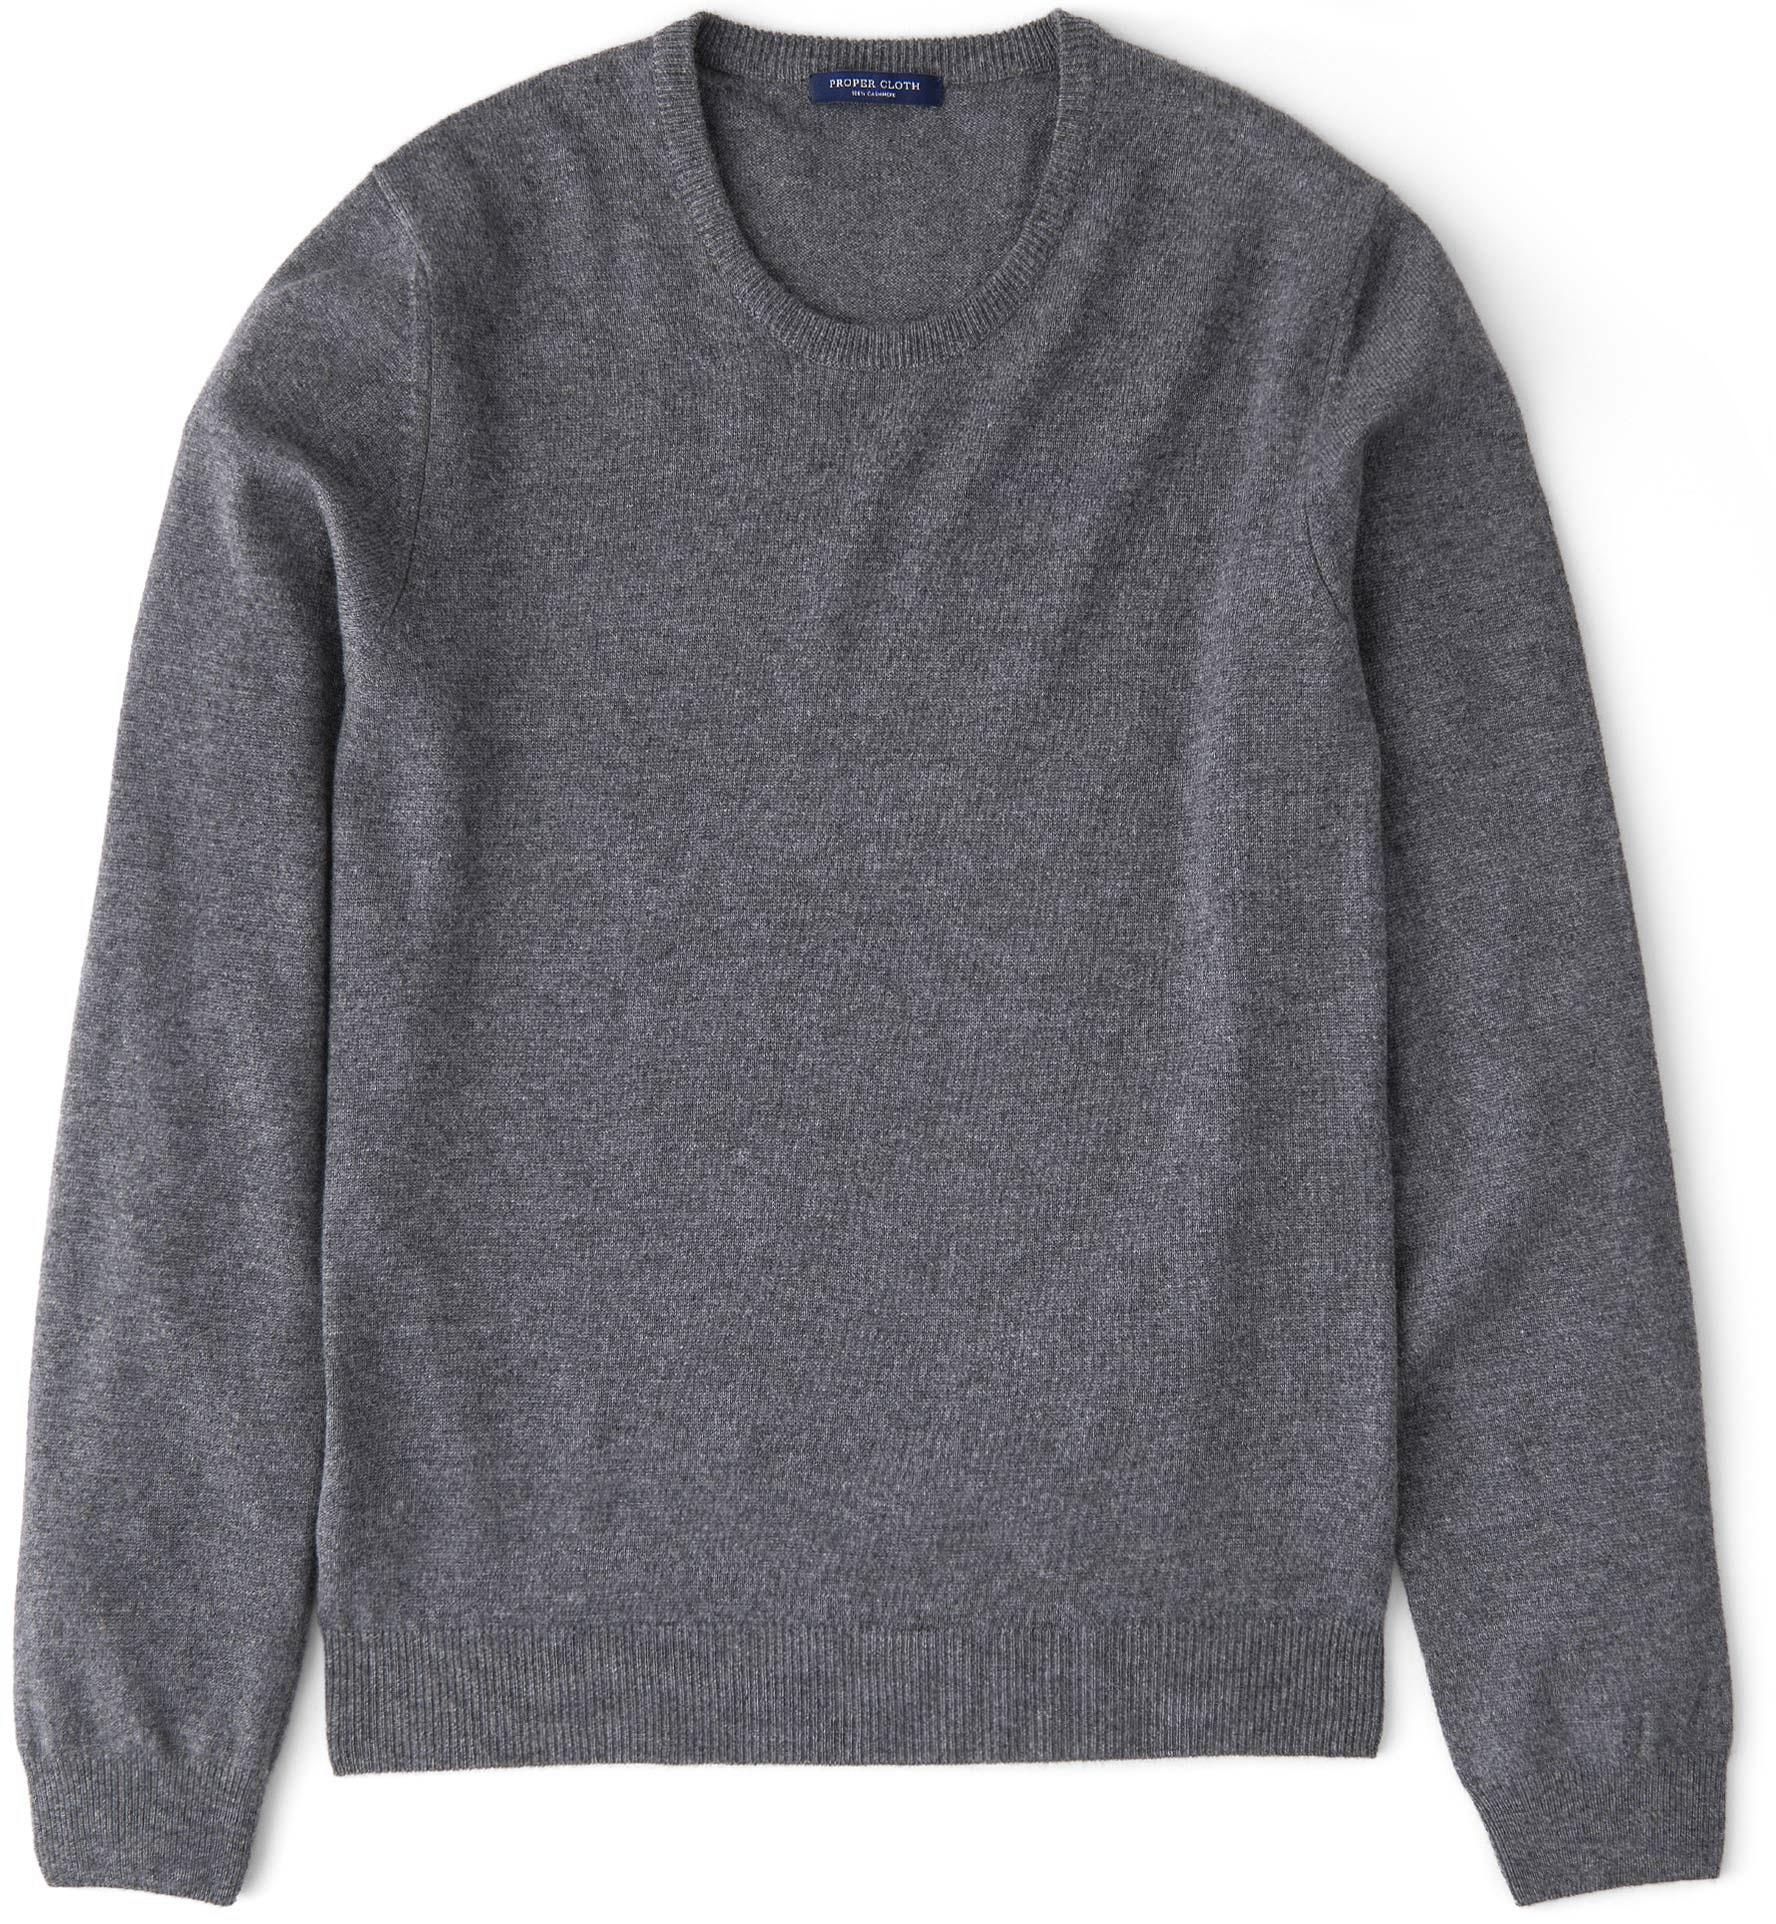 Zoom Image of Grey Cashmere Crewneck Sweater